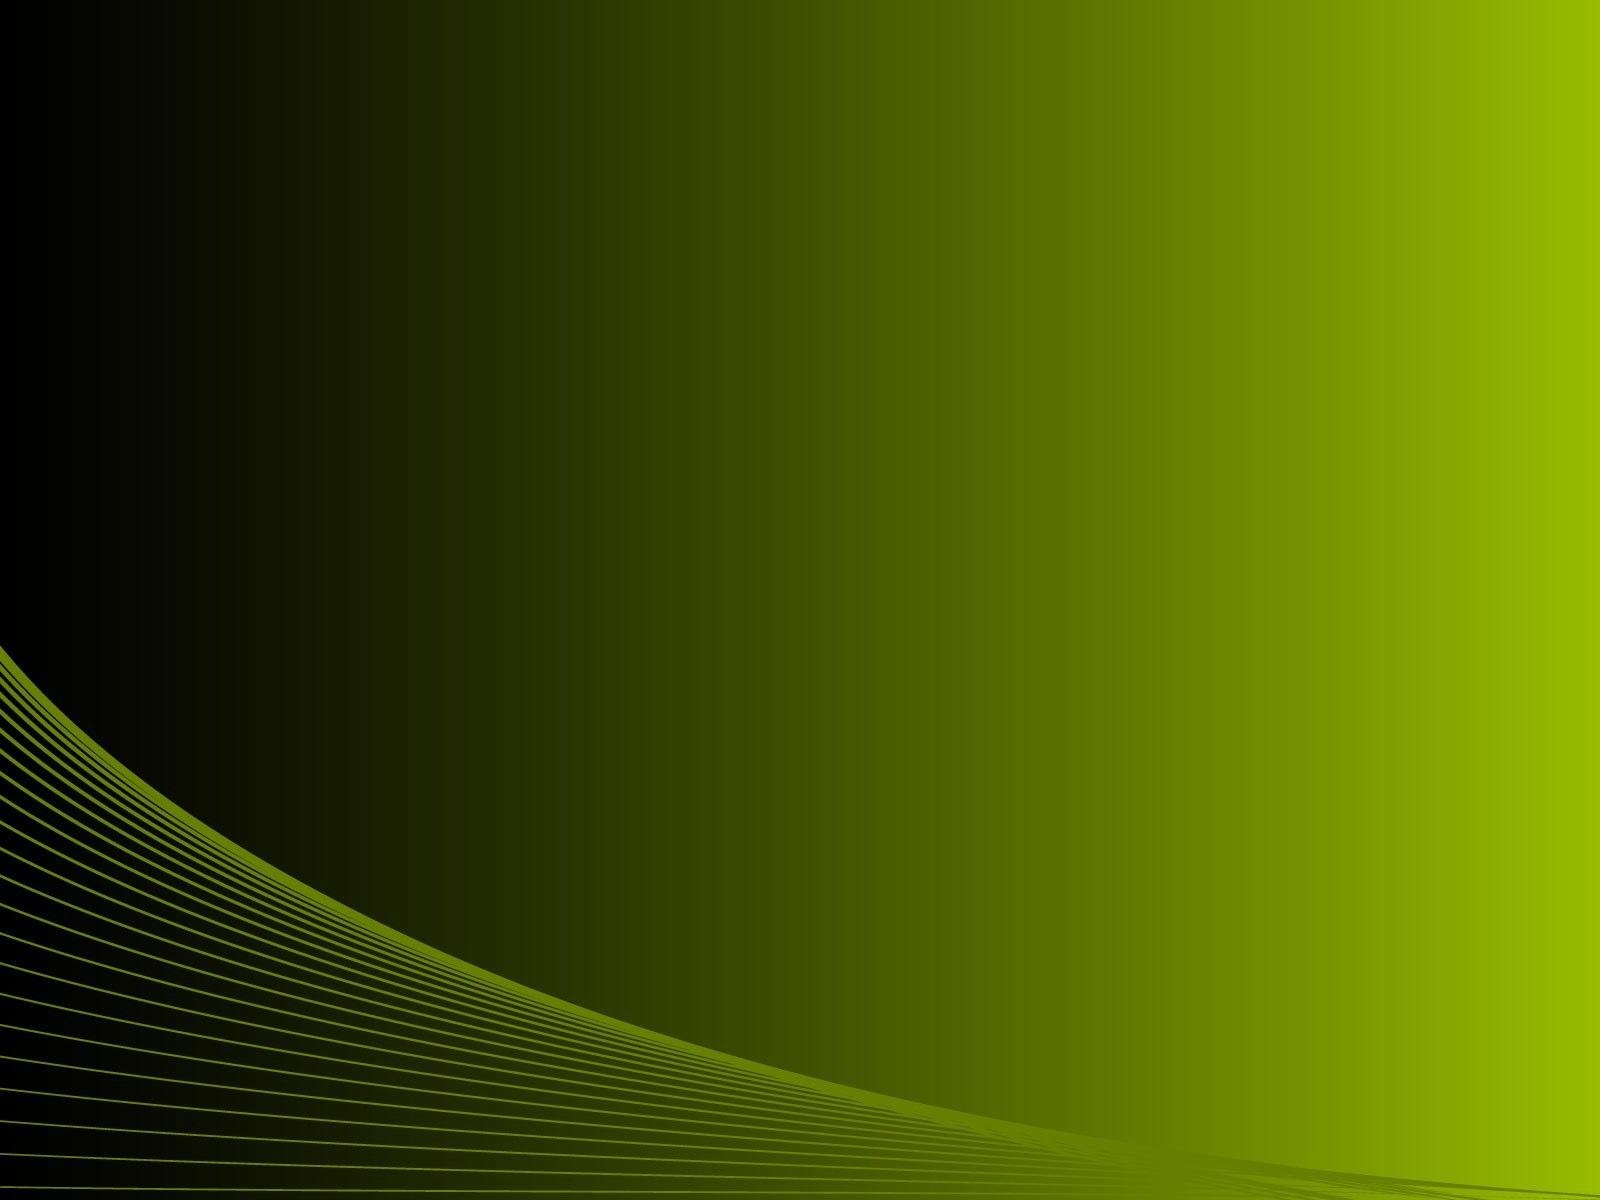 formal black green lines backgrounds wallpapersjpg 1600x1200